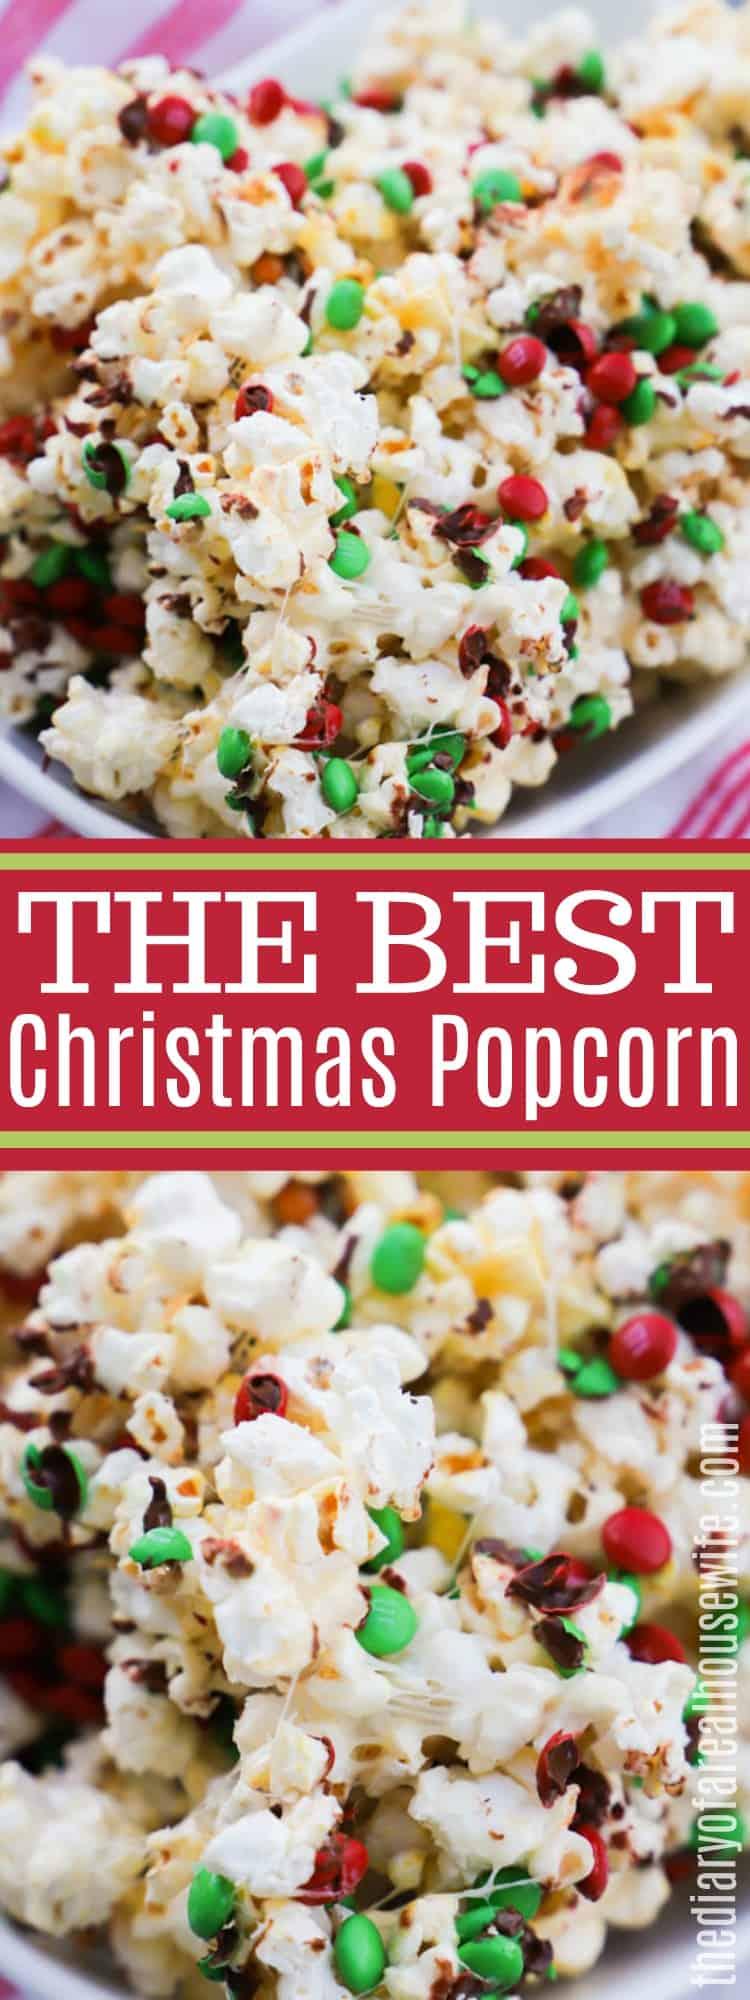 Christmas Popcorn